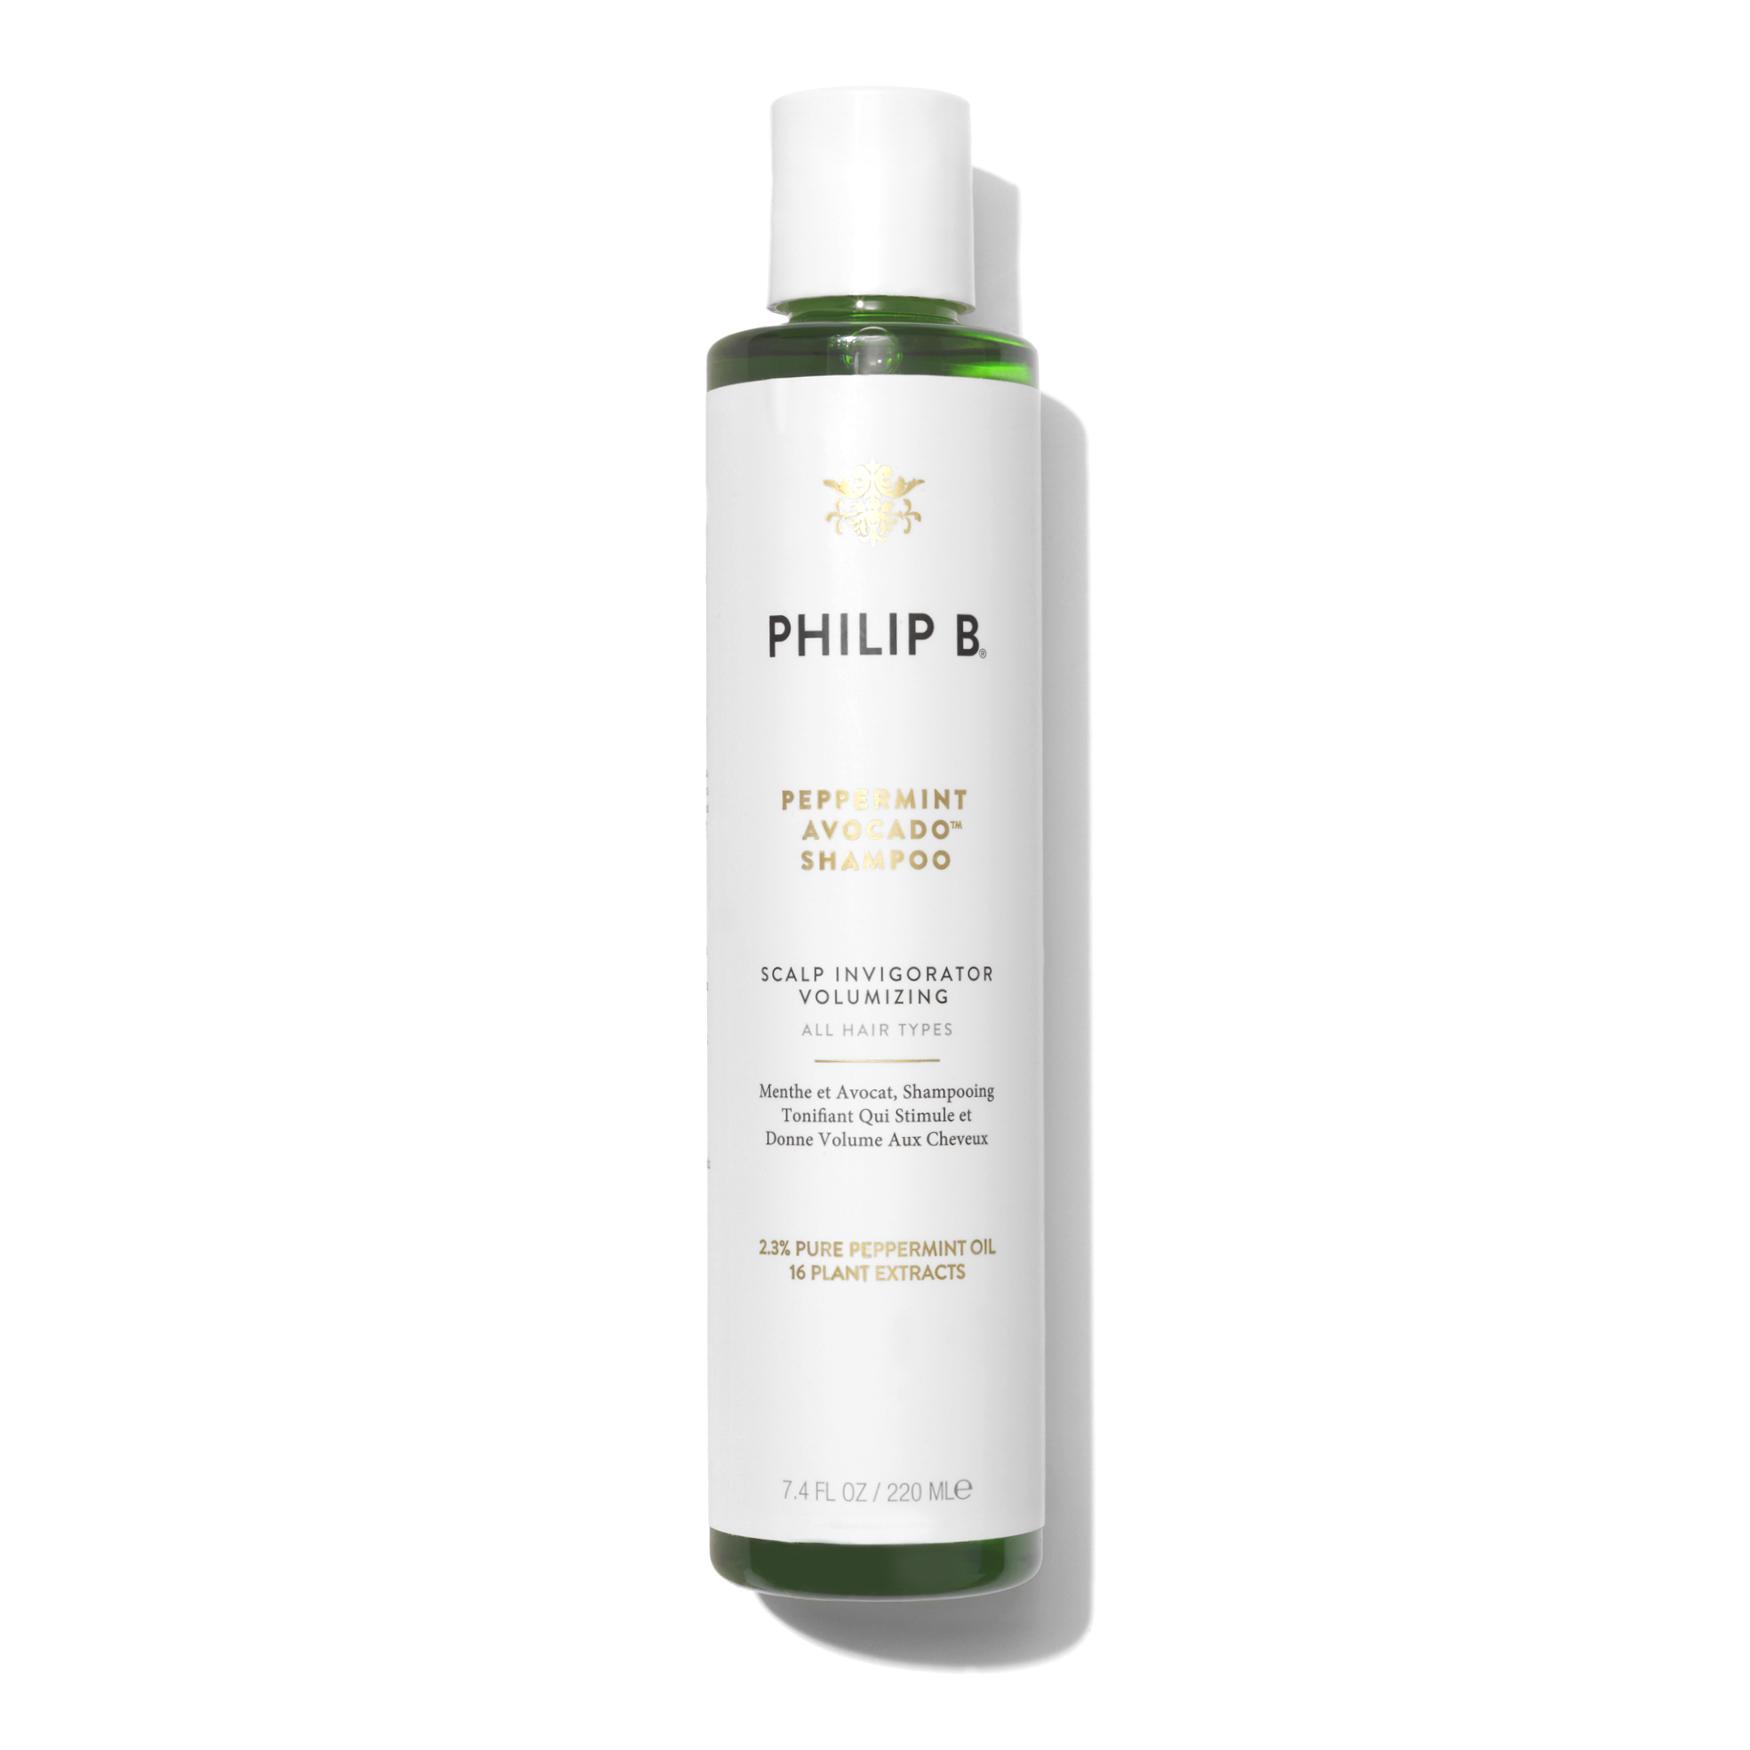 Peppermint and Avocado Clarifying Shampoo, , large